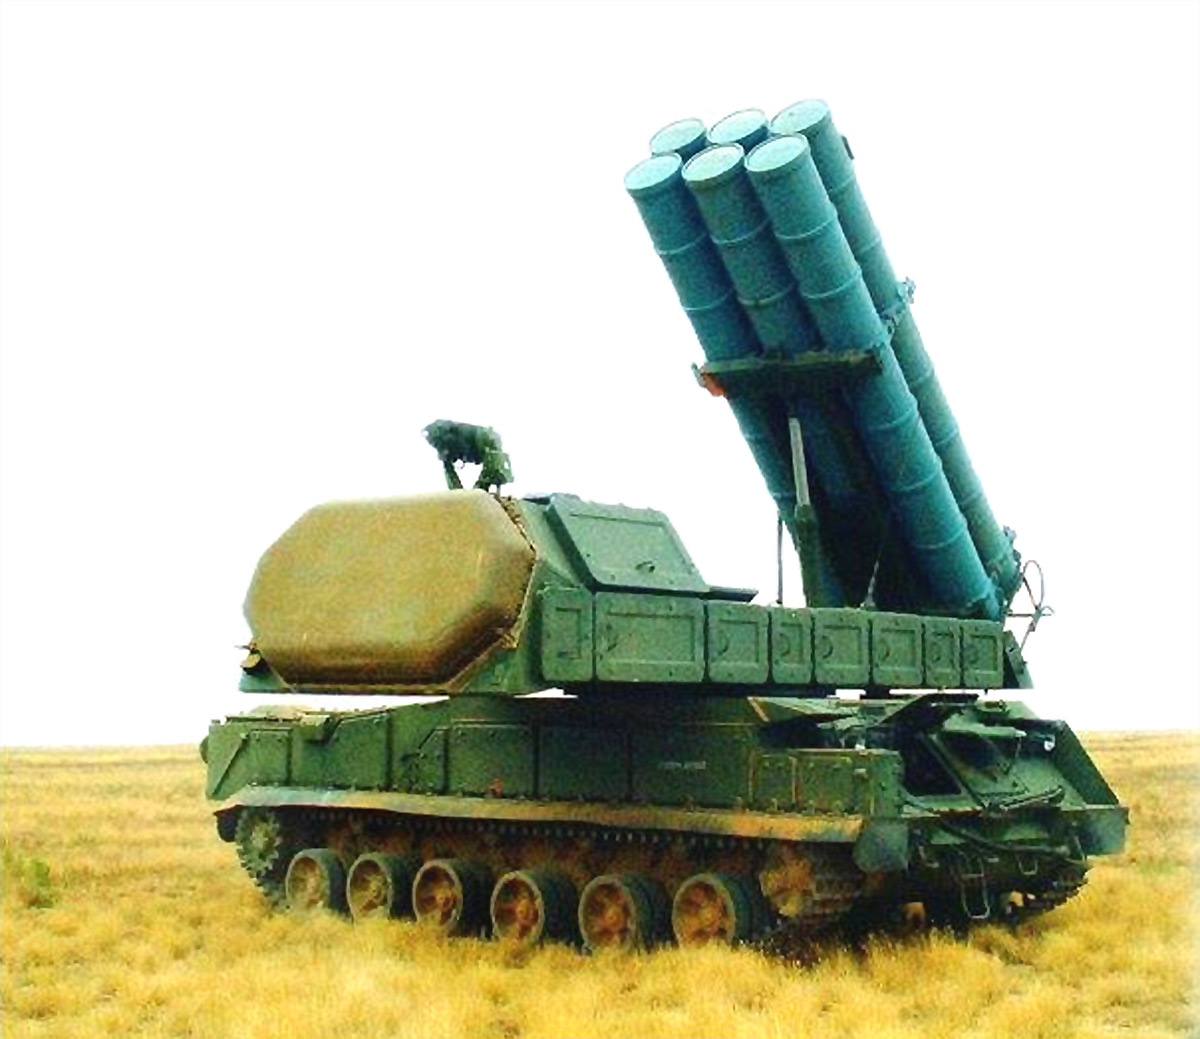 http://militaryrussia.ru/i/284/772/6pKCt.jpg